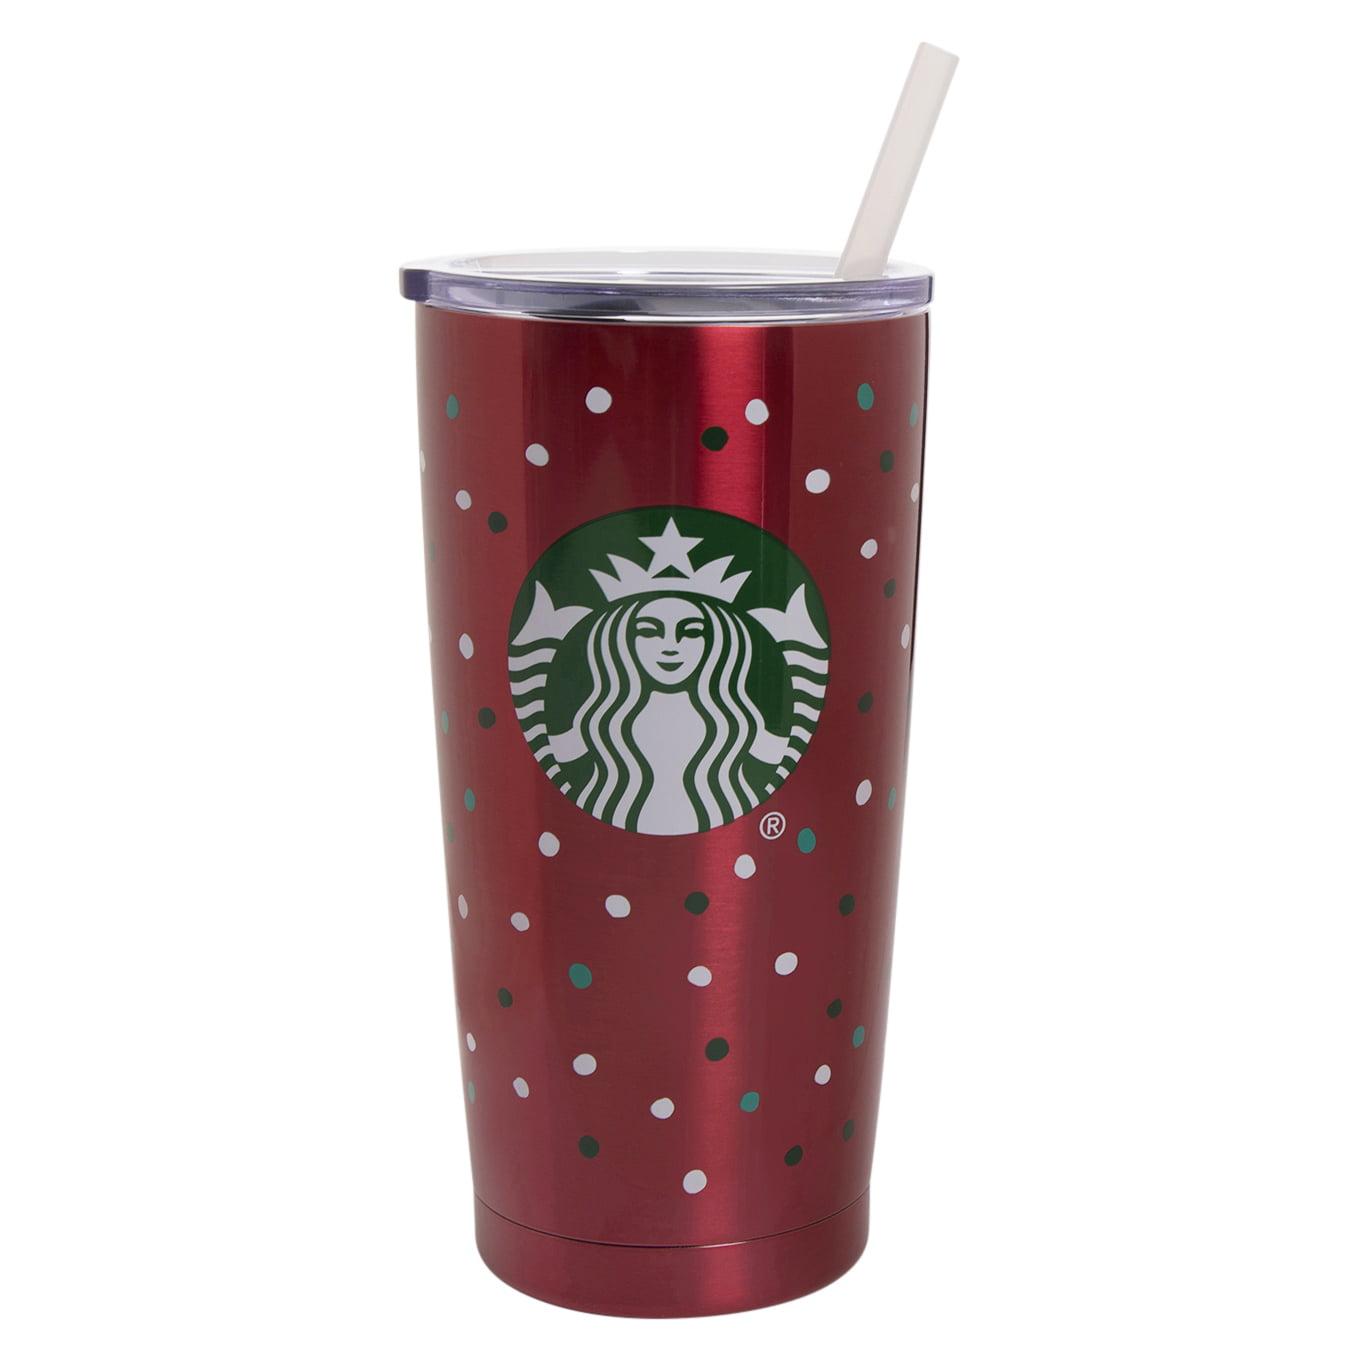 Starbucks 20 Ounce Red Stainless Steel Vacuum Tumbler